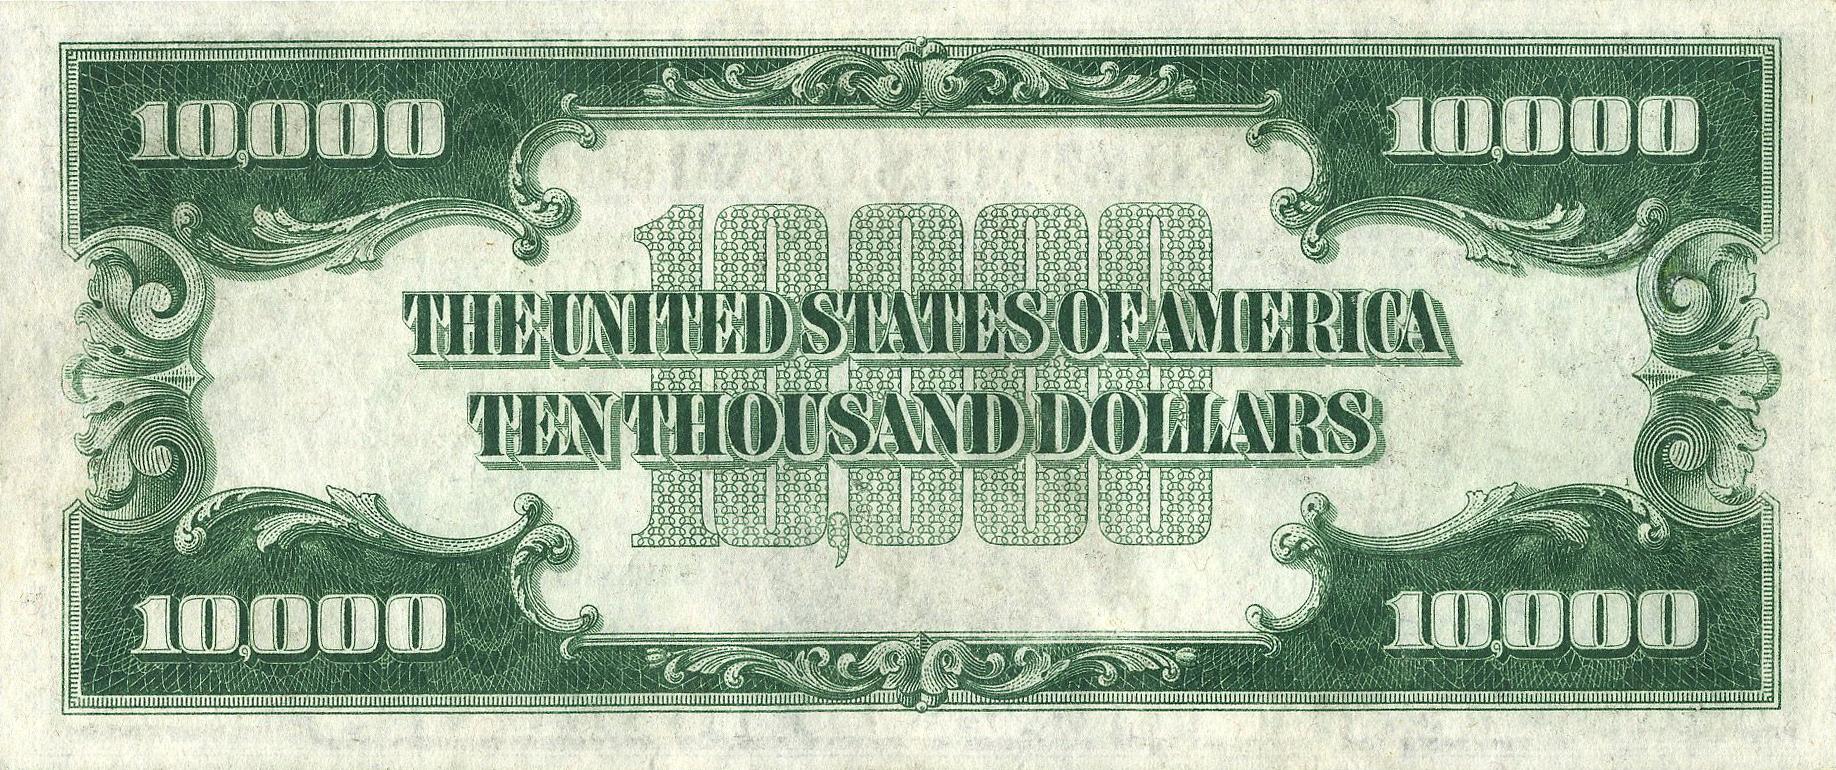 1 dolláros opciós stratégia